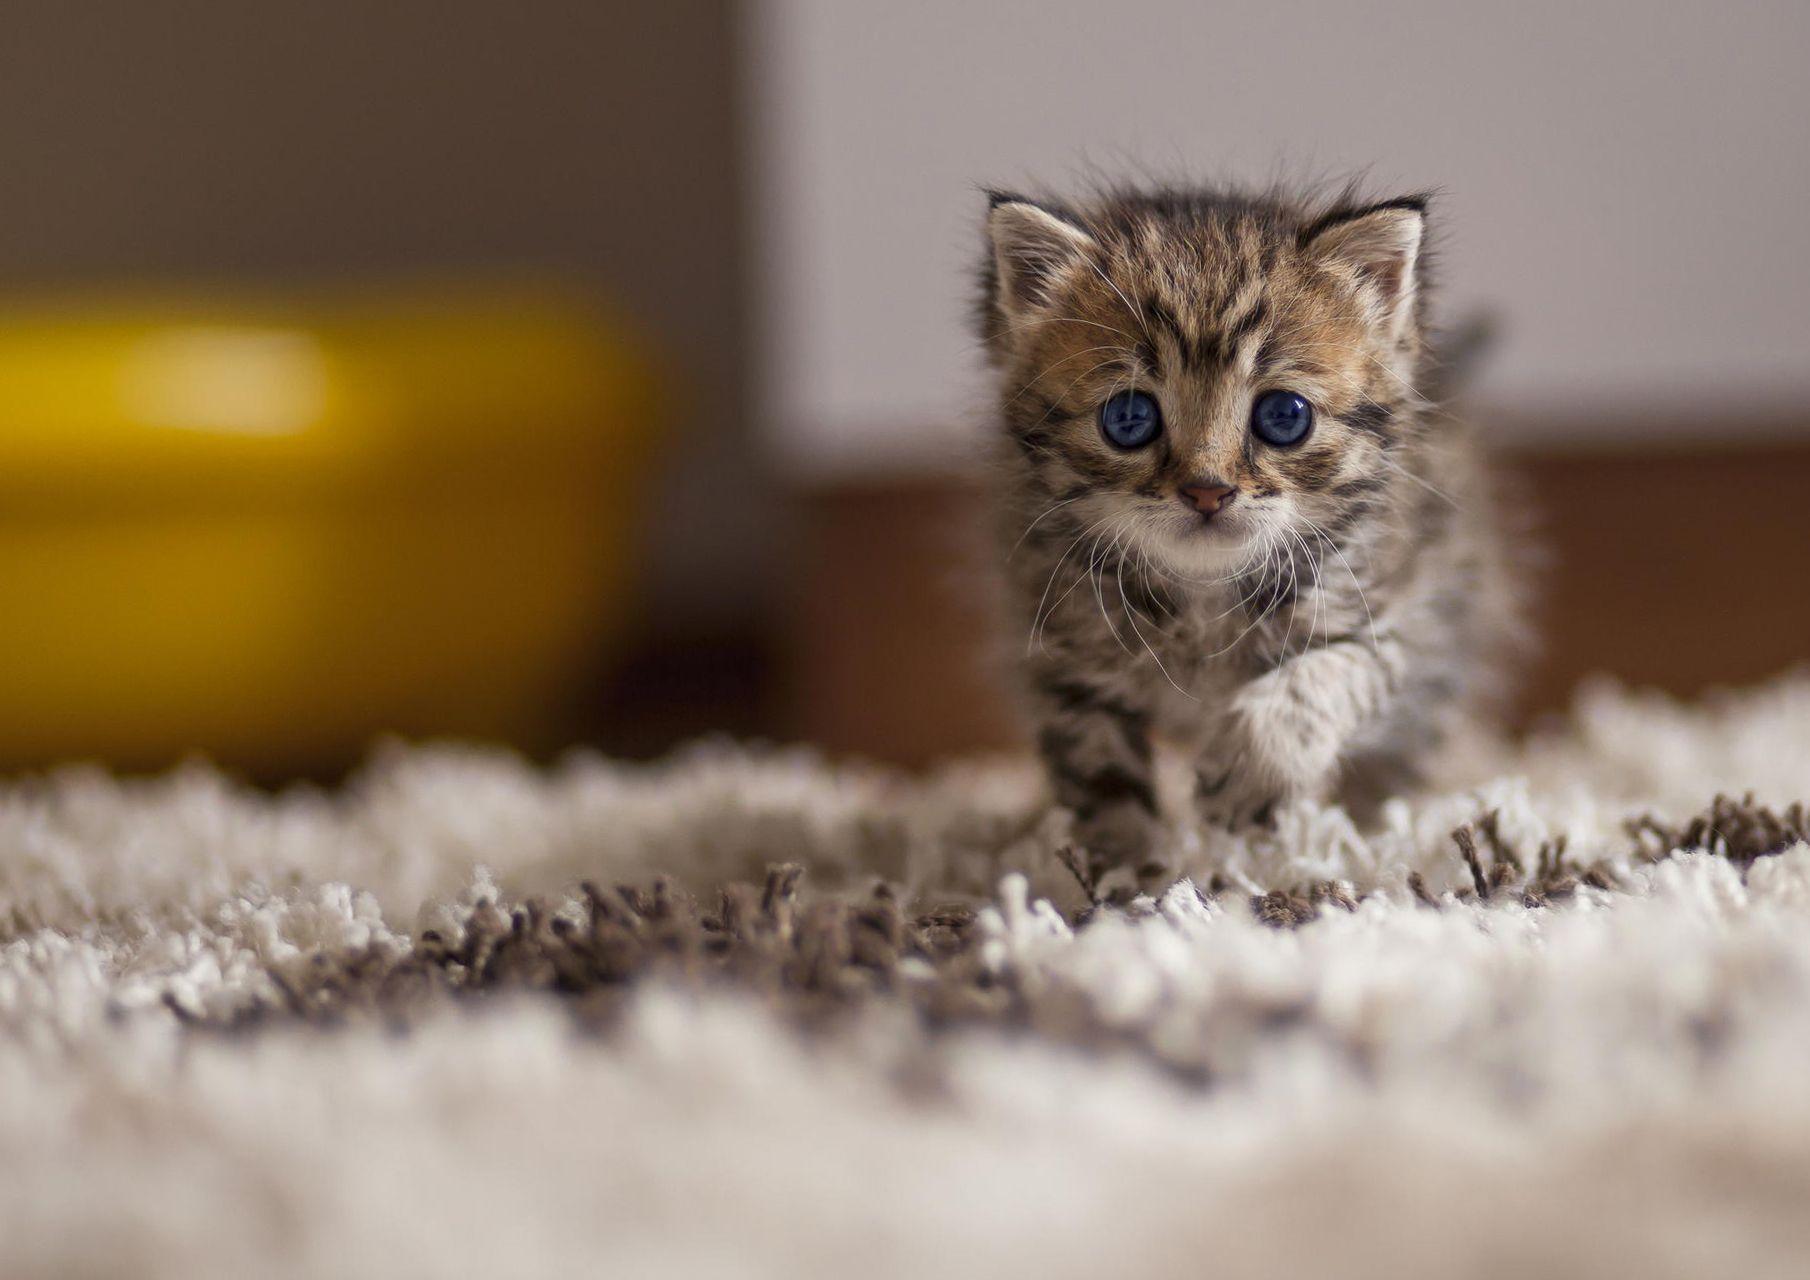 Cute Cat Wallpaper Of Cats